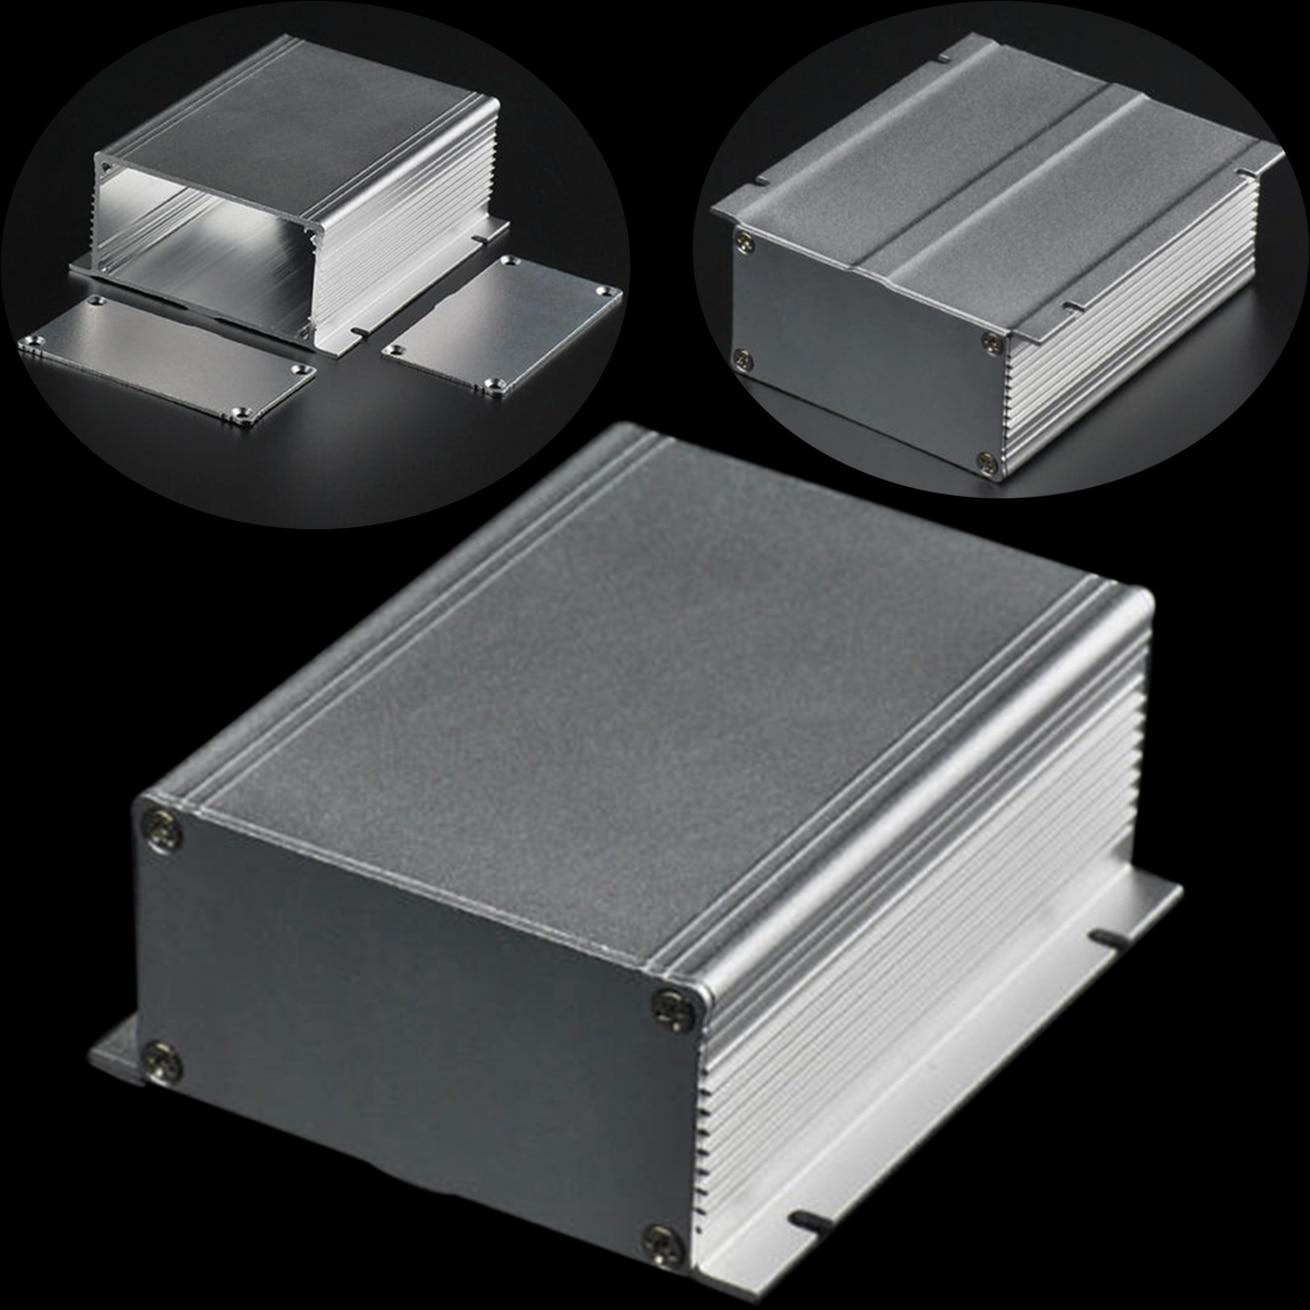 1pc Silver Extruded Aluminum Enclosure Electronic Power PCB Instrument Box Case 88x39x100mm 1 piece free shipping aluminium enclosure case aluminium extruded enclosure in silver color smooth surface silver color box